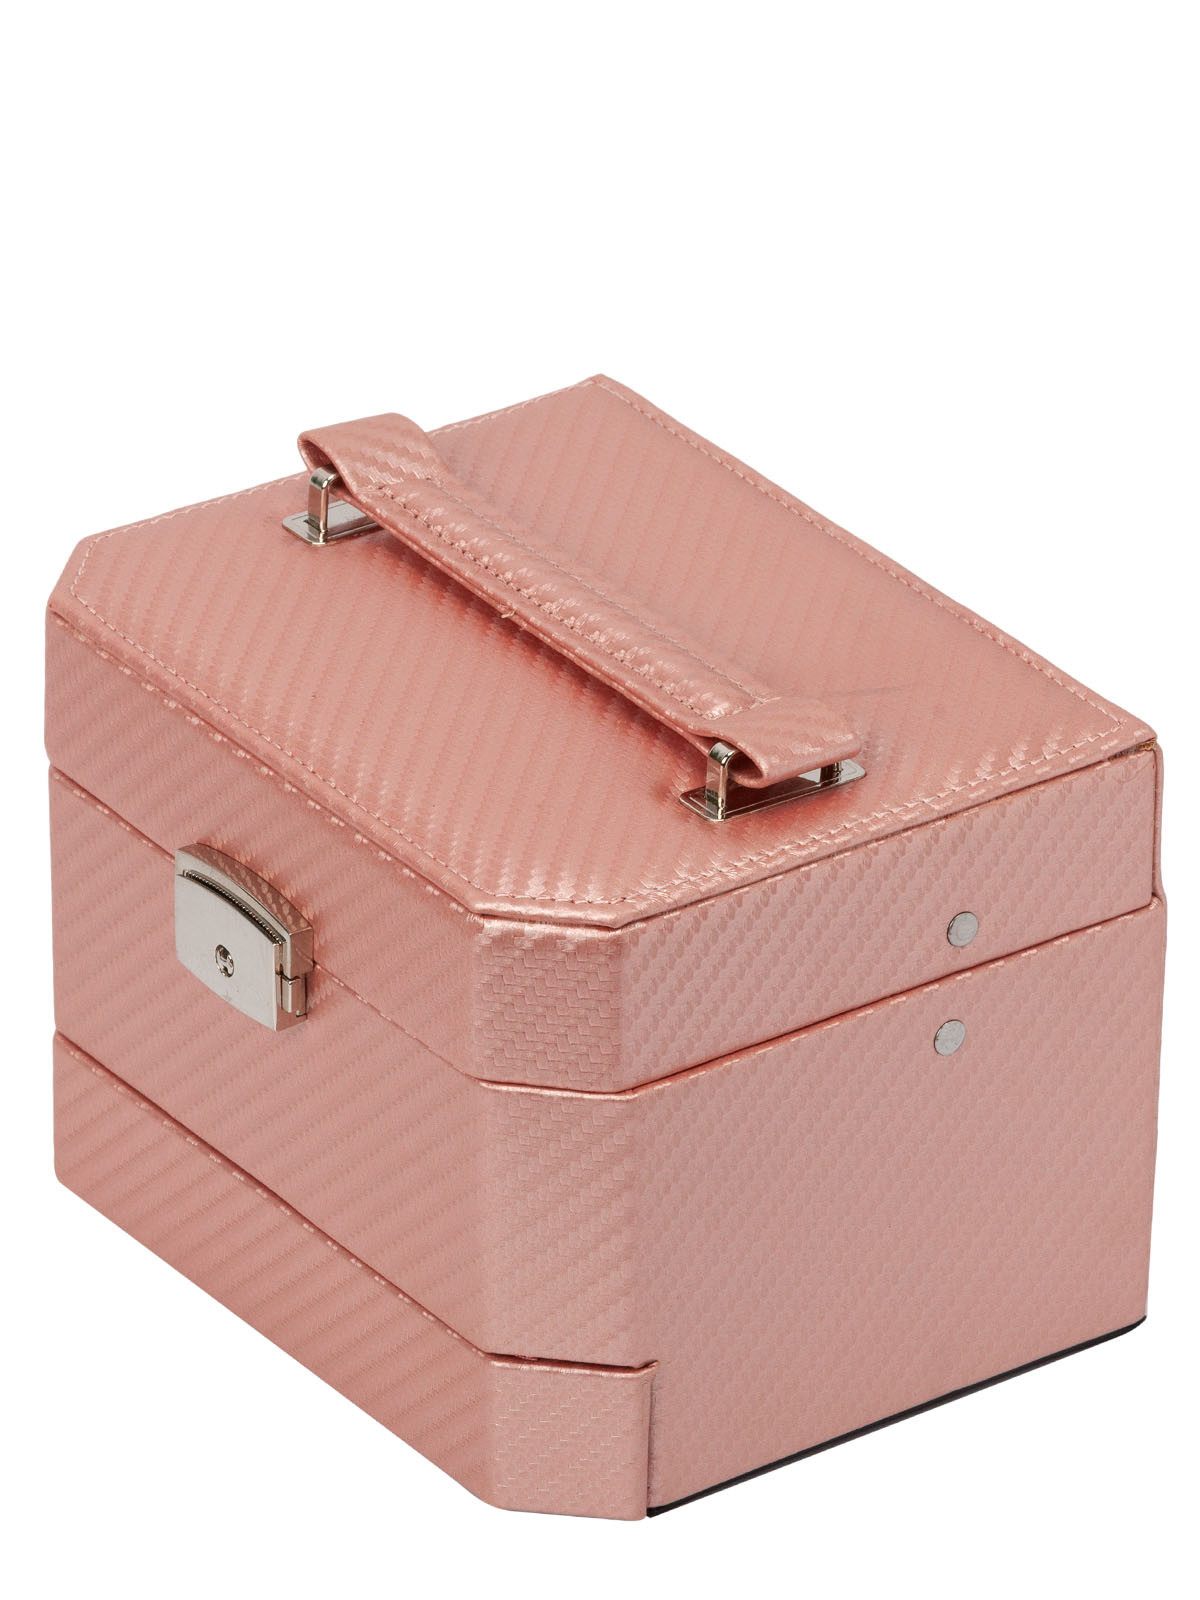 Шкатулка для украшений S-502D2-6PW светло-розовый